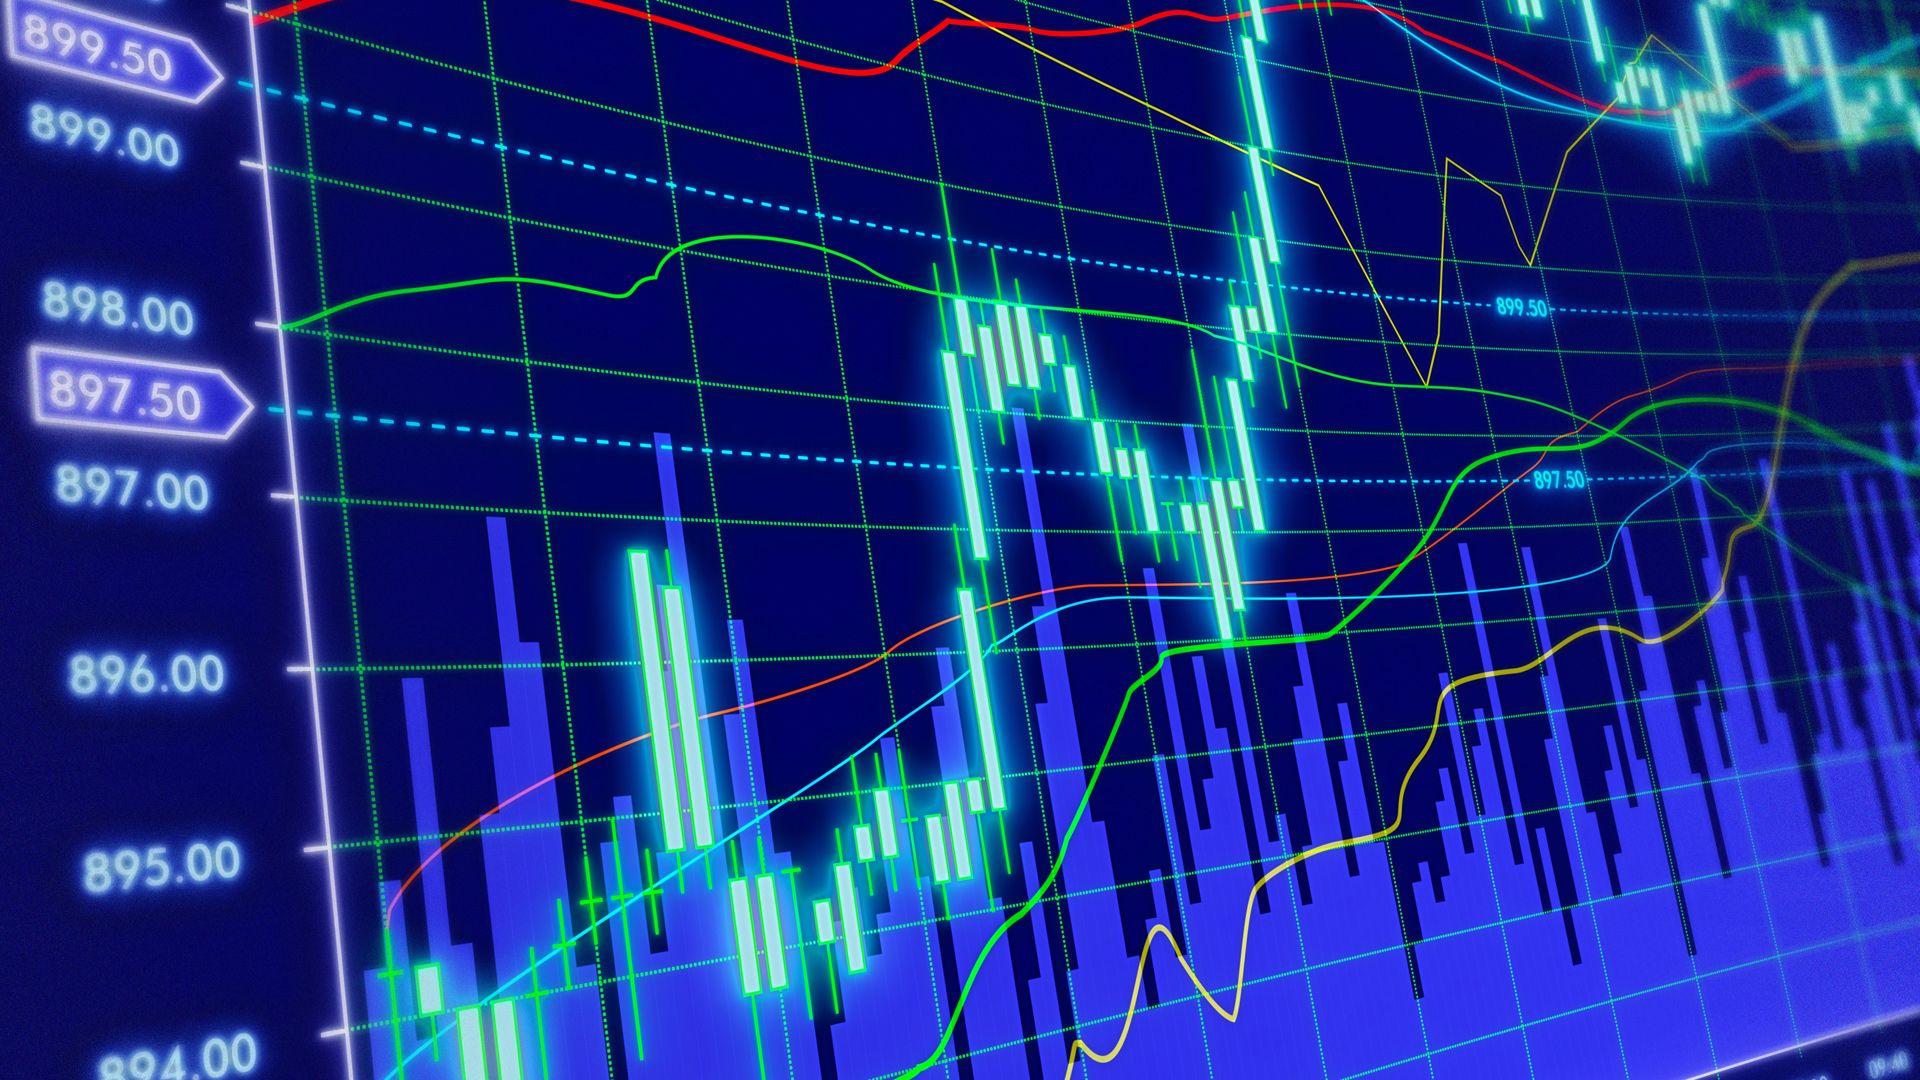 trading online opzionni binarie